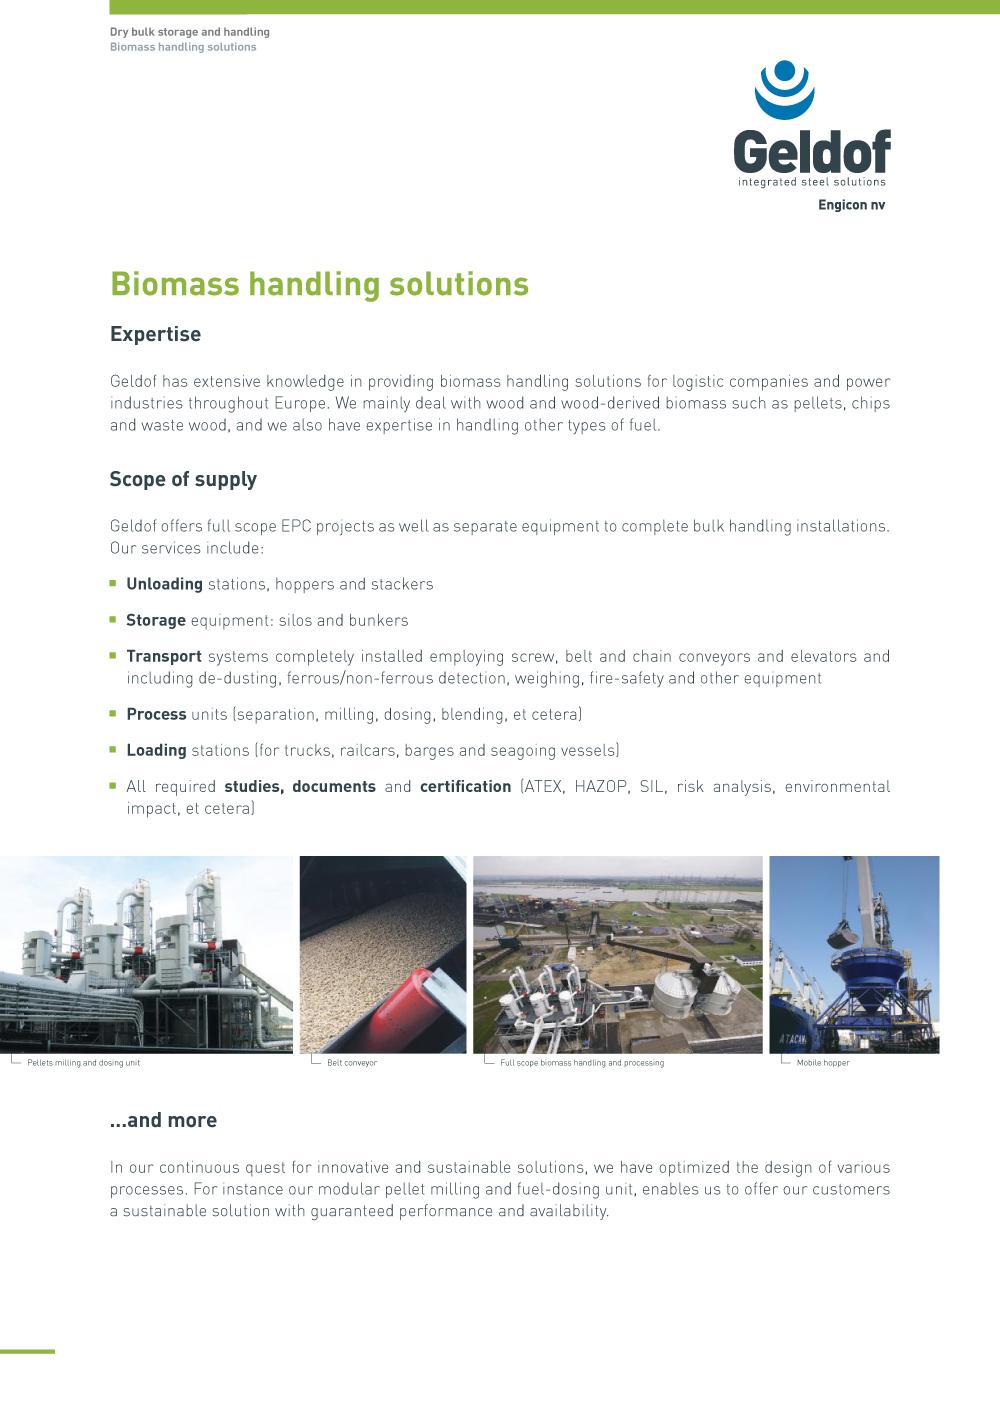 Geldof - Flyer - DB - Biomass handling solutions - ENG - 2017